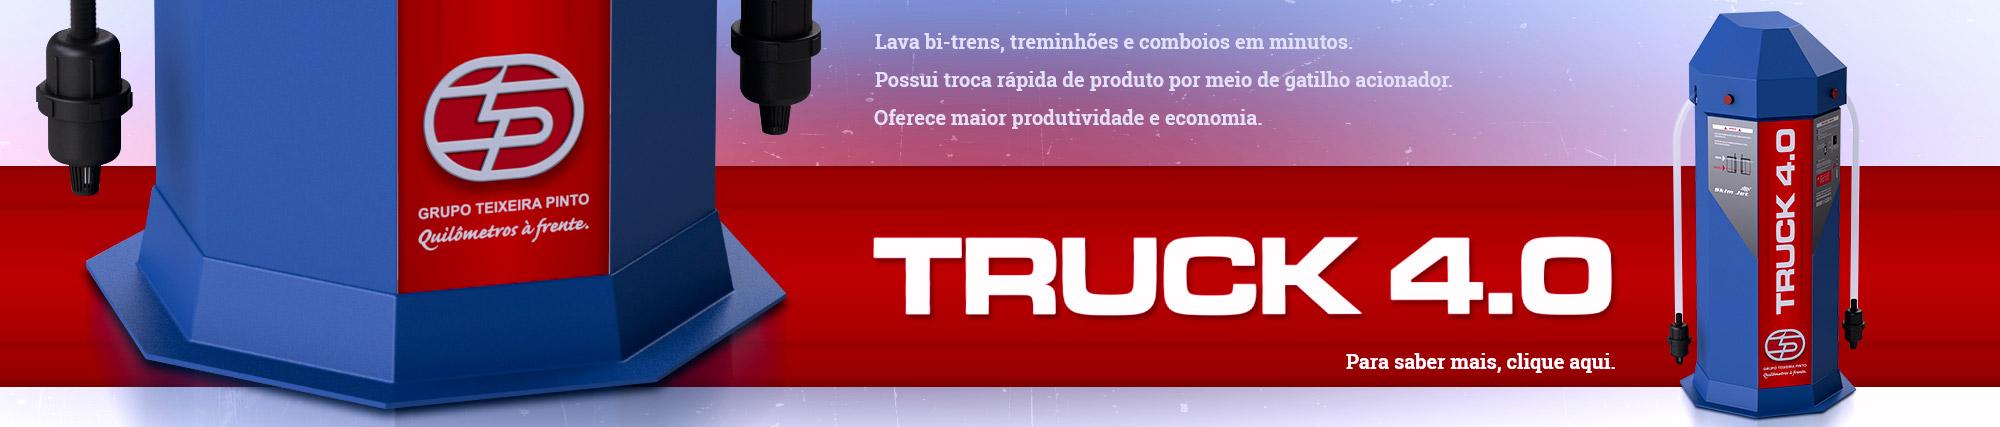 Truck 4.0